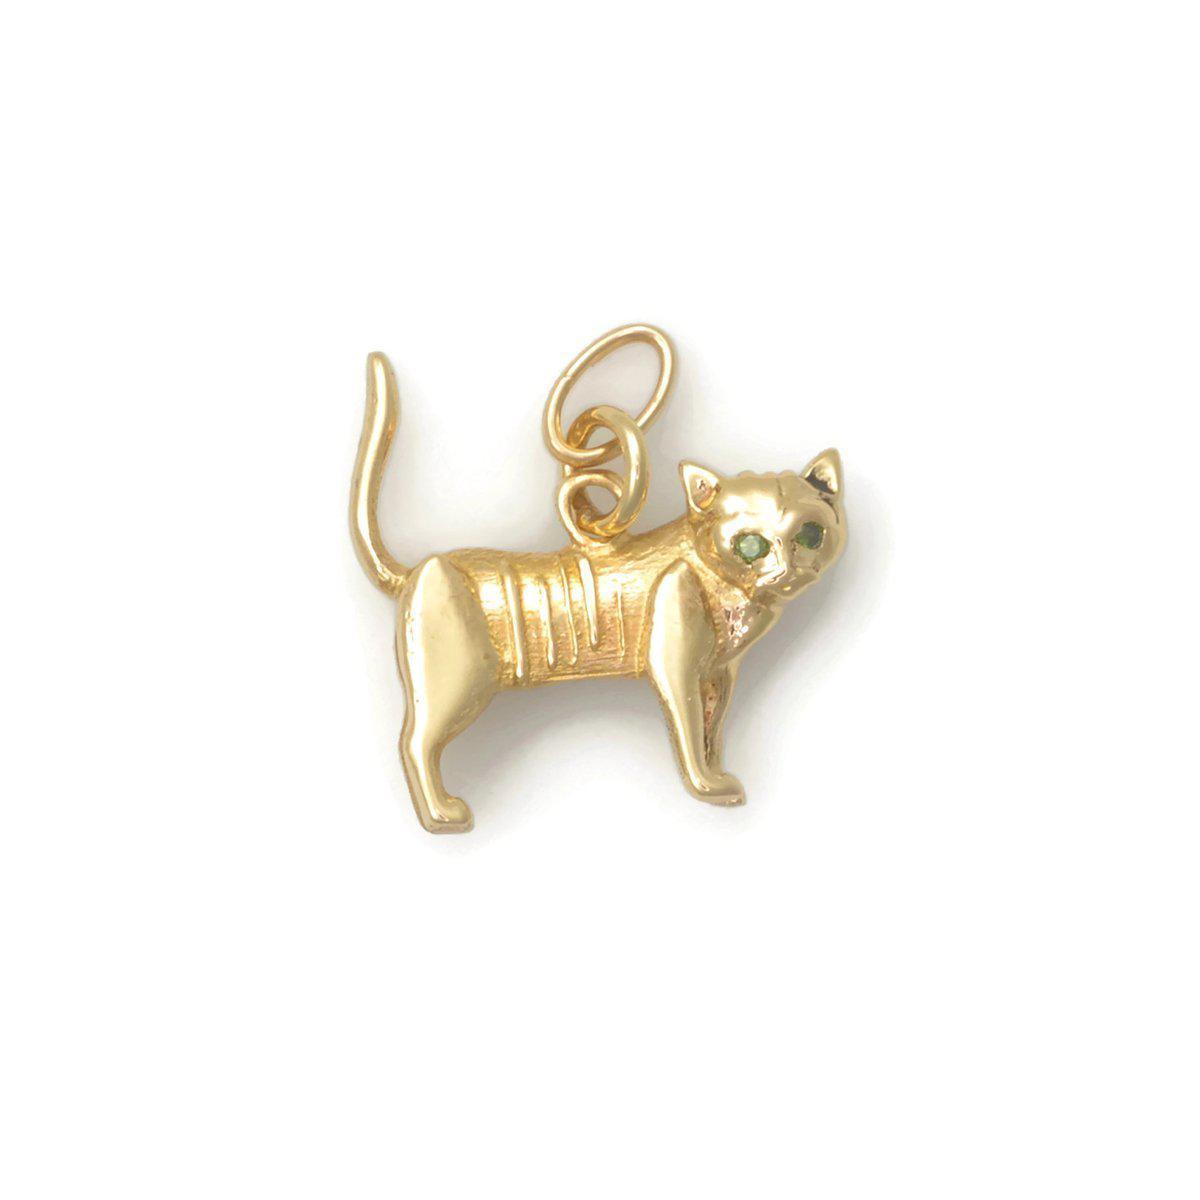 Donna Pizarro Designs 14kt Yellow Gold Shihtzu Charm W1cM9